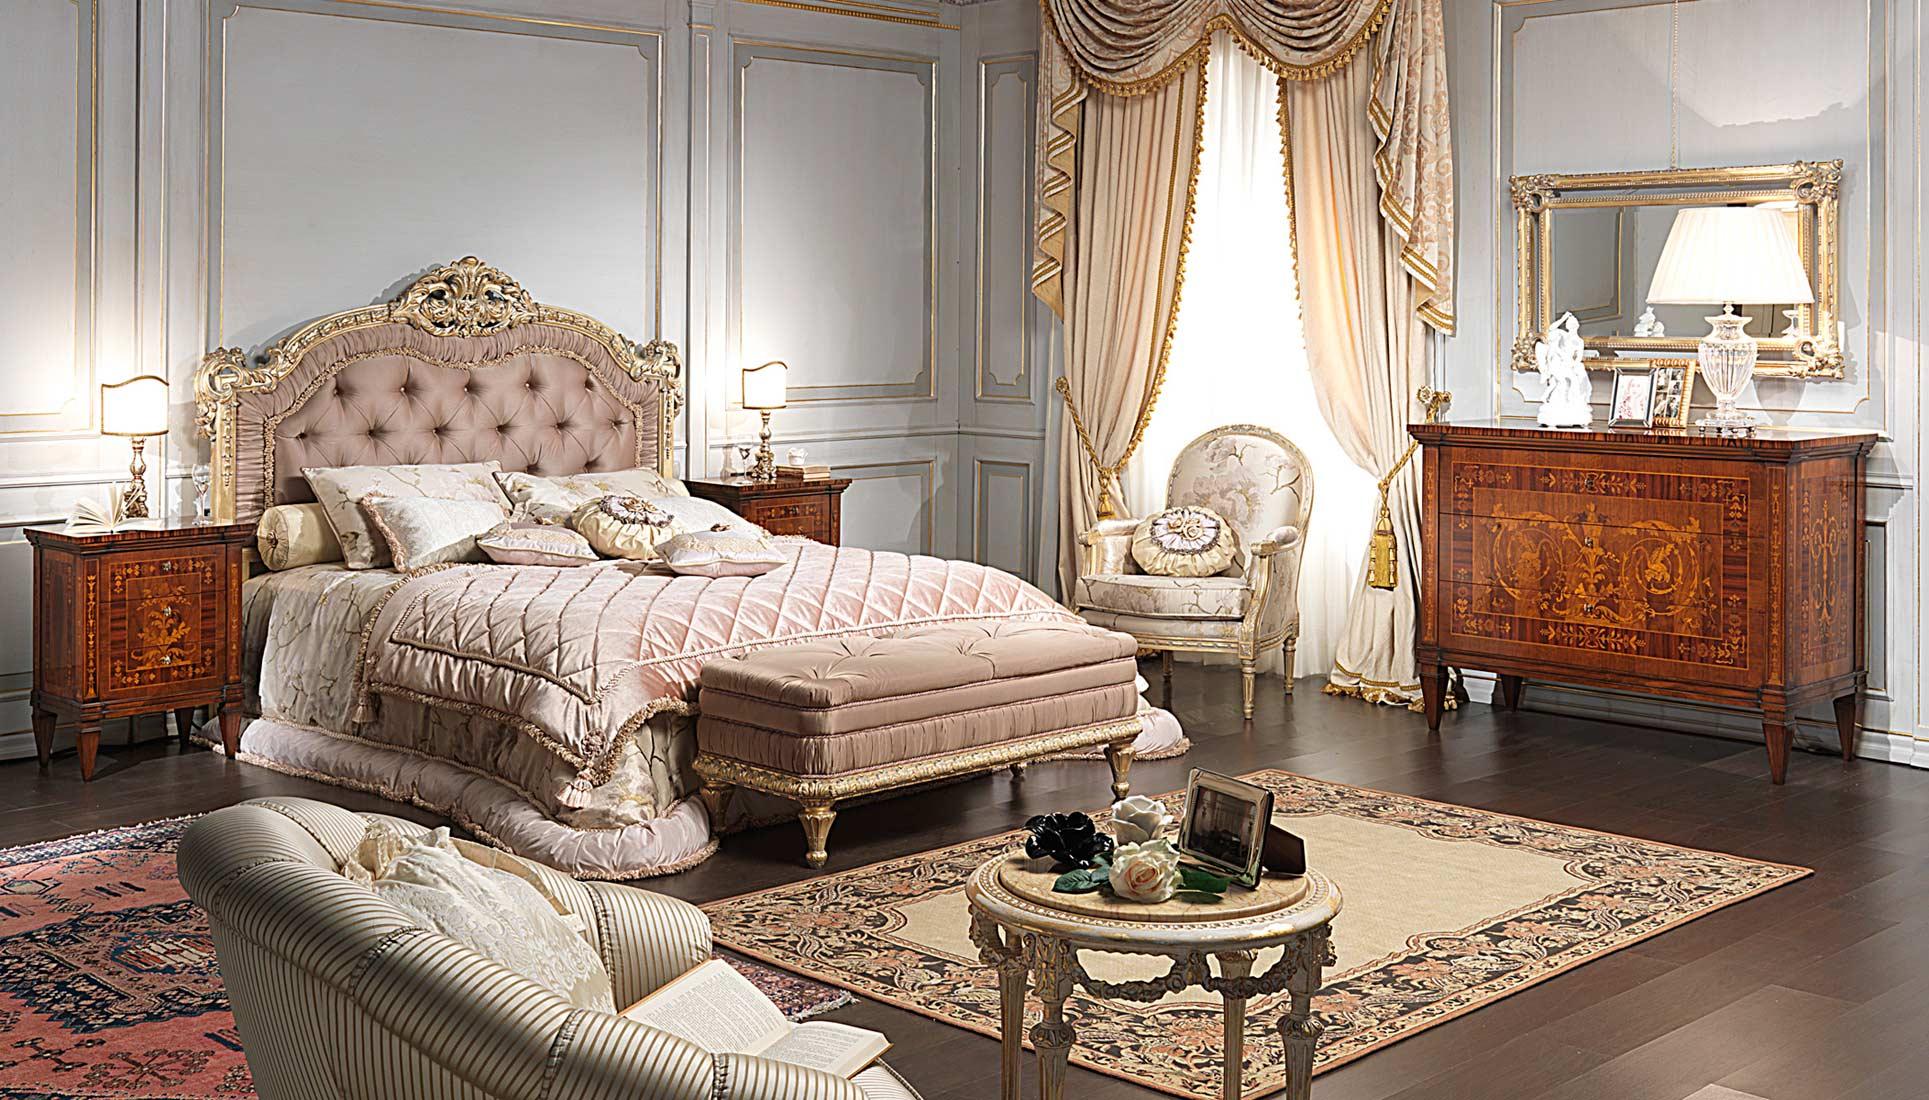 Classic Bedroom Maggiolini Capitonn 232 Bed Night Tables